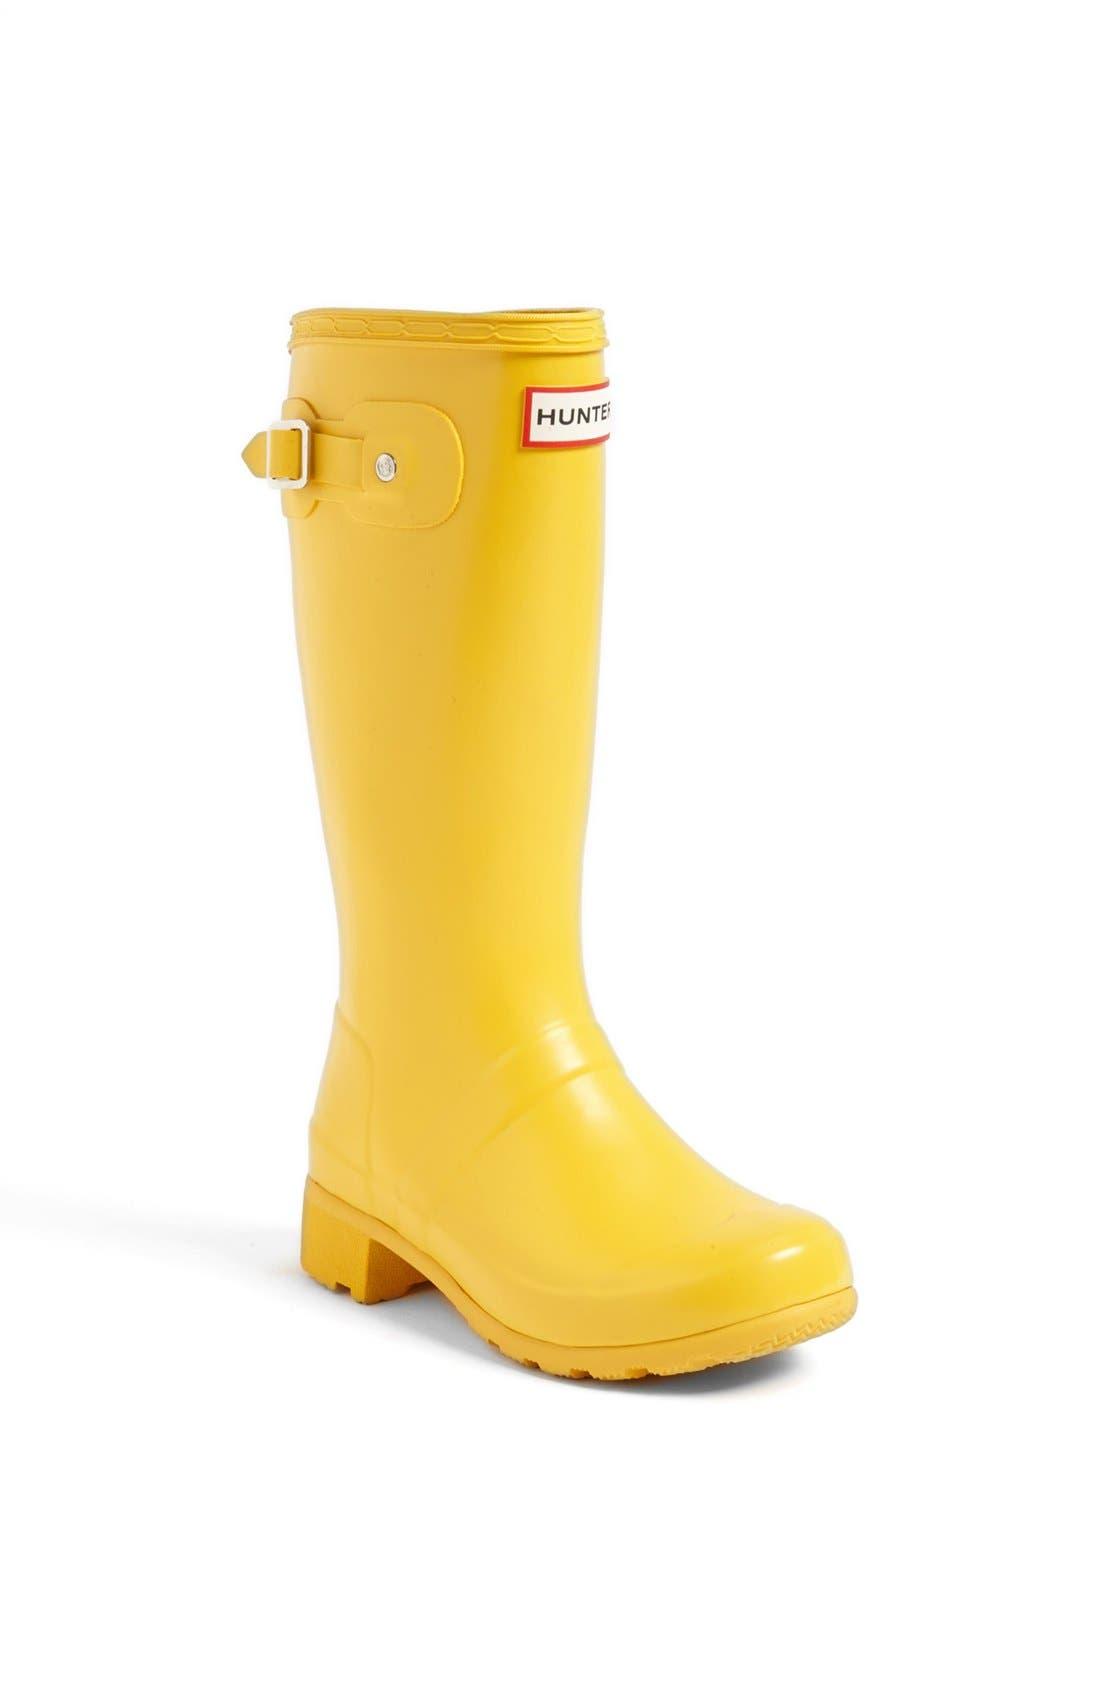 Main Image - Hunter 'Tour' Packable Rain Boot (Toddler & Little Kid)